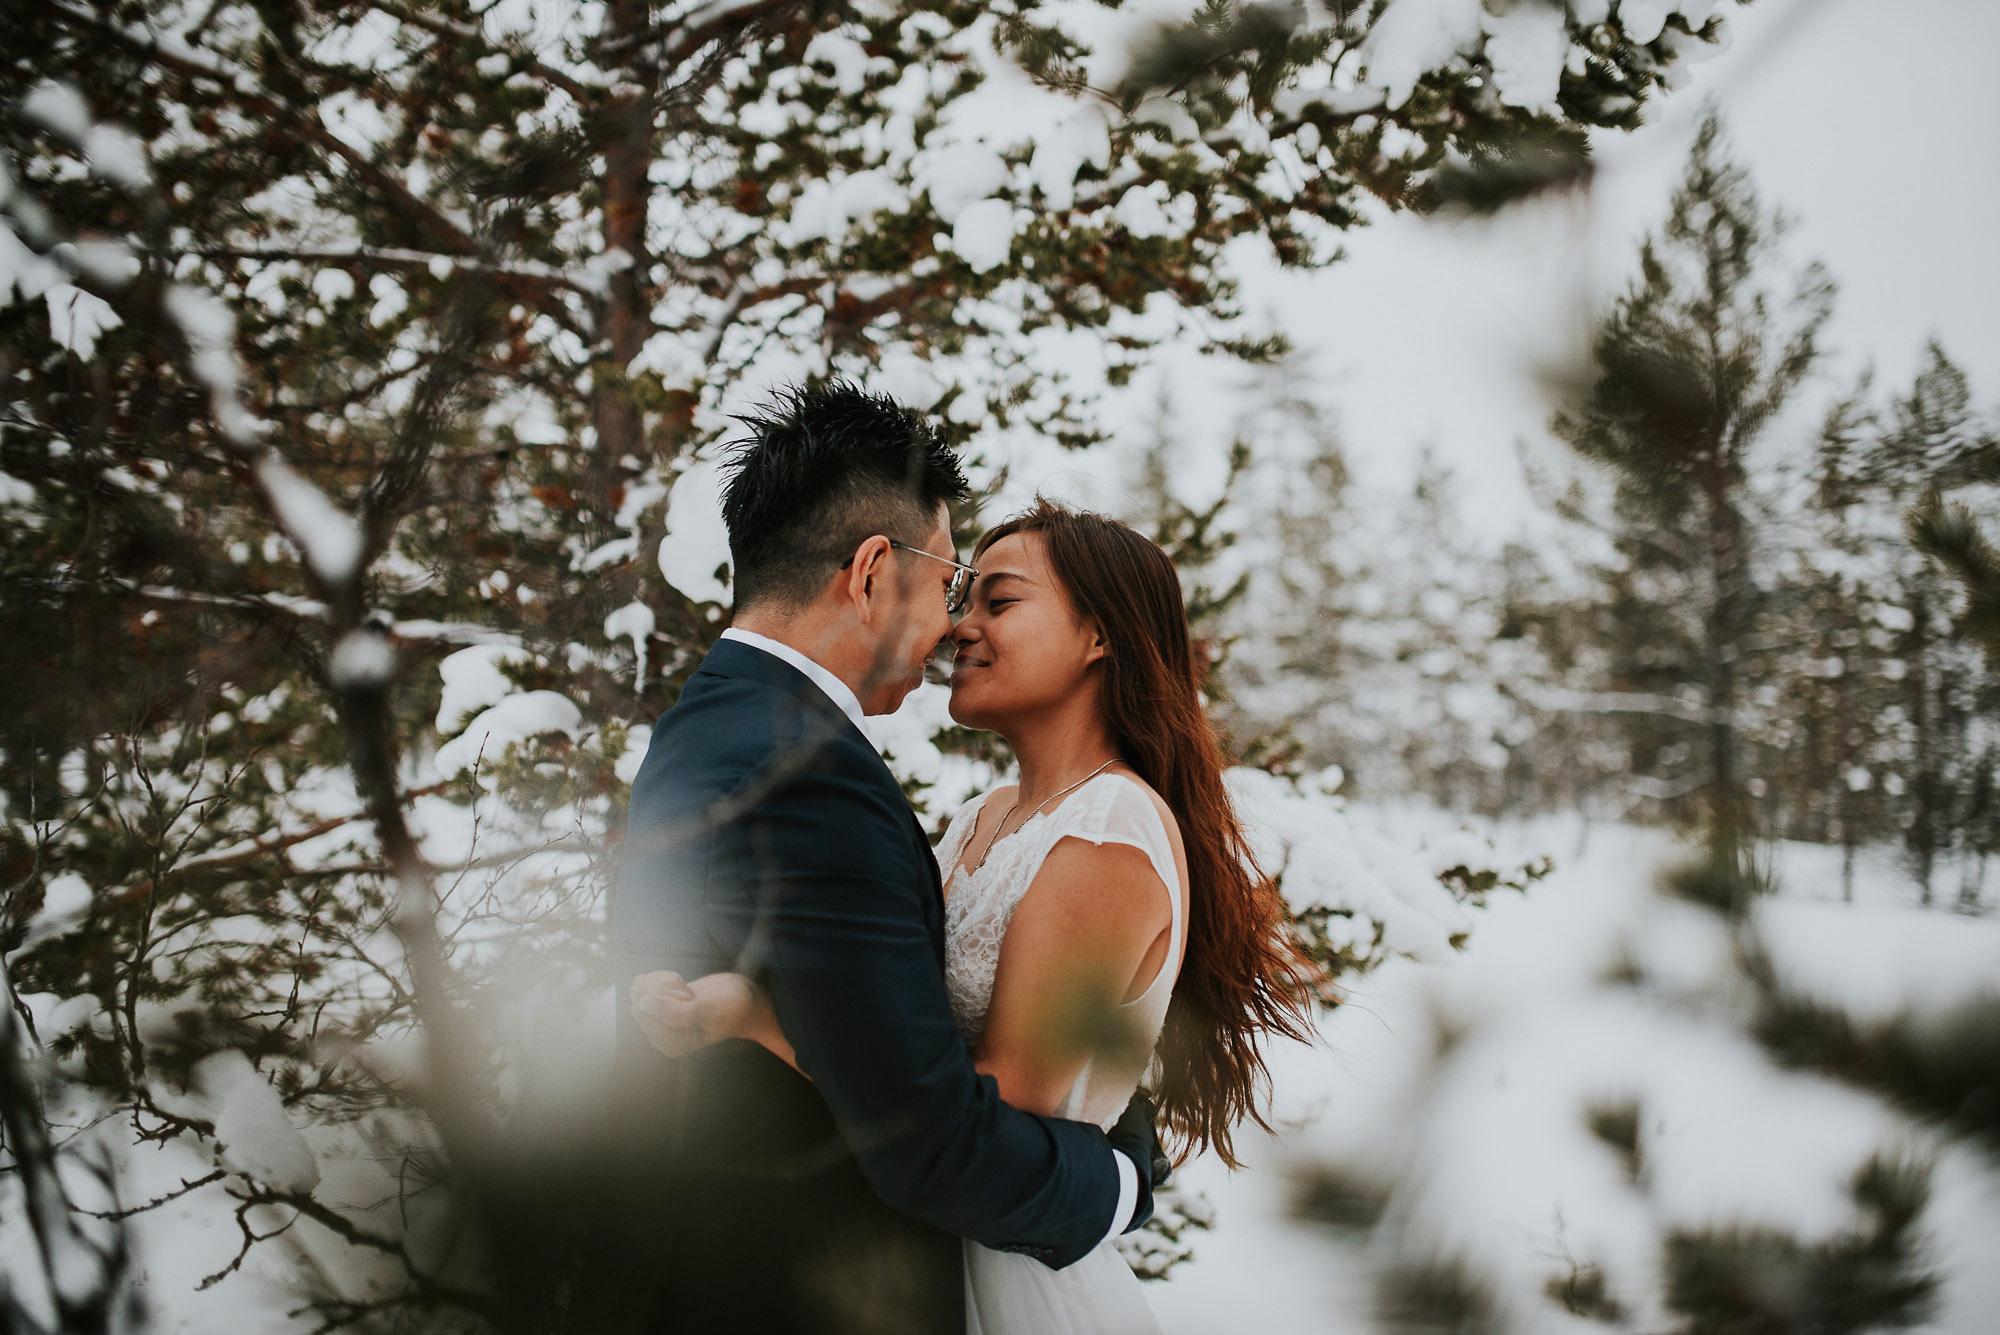 levi-ice-chapel-weddings-lapland-finland-photographer-jere-satamo-026-blog.jpg